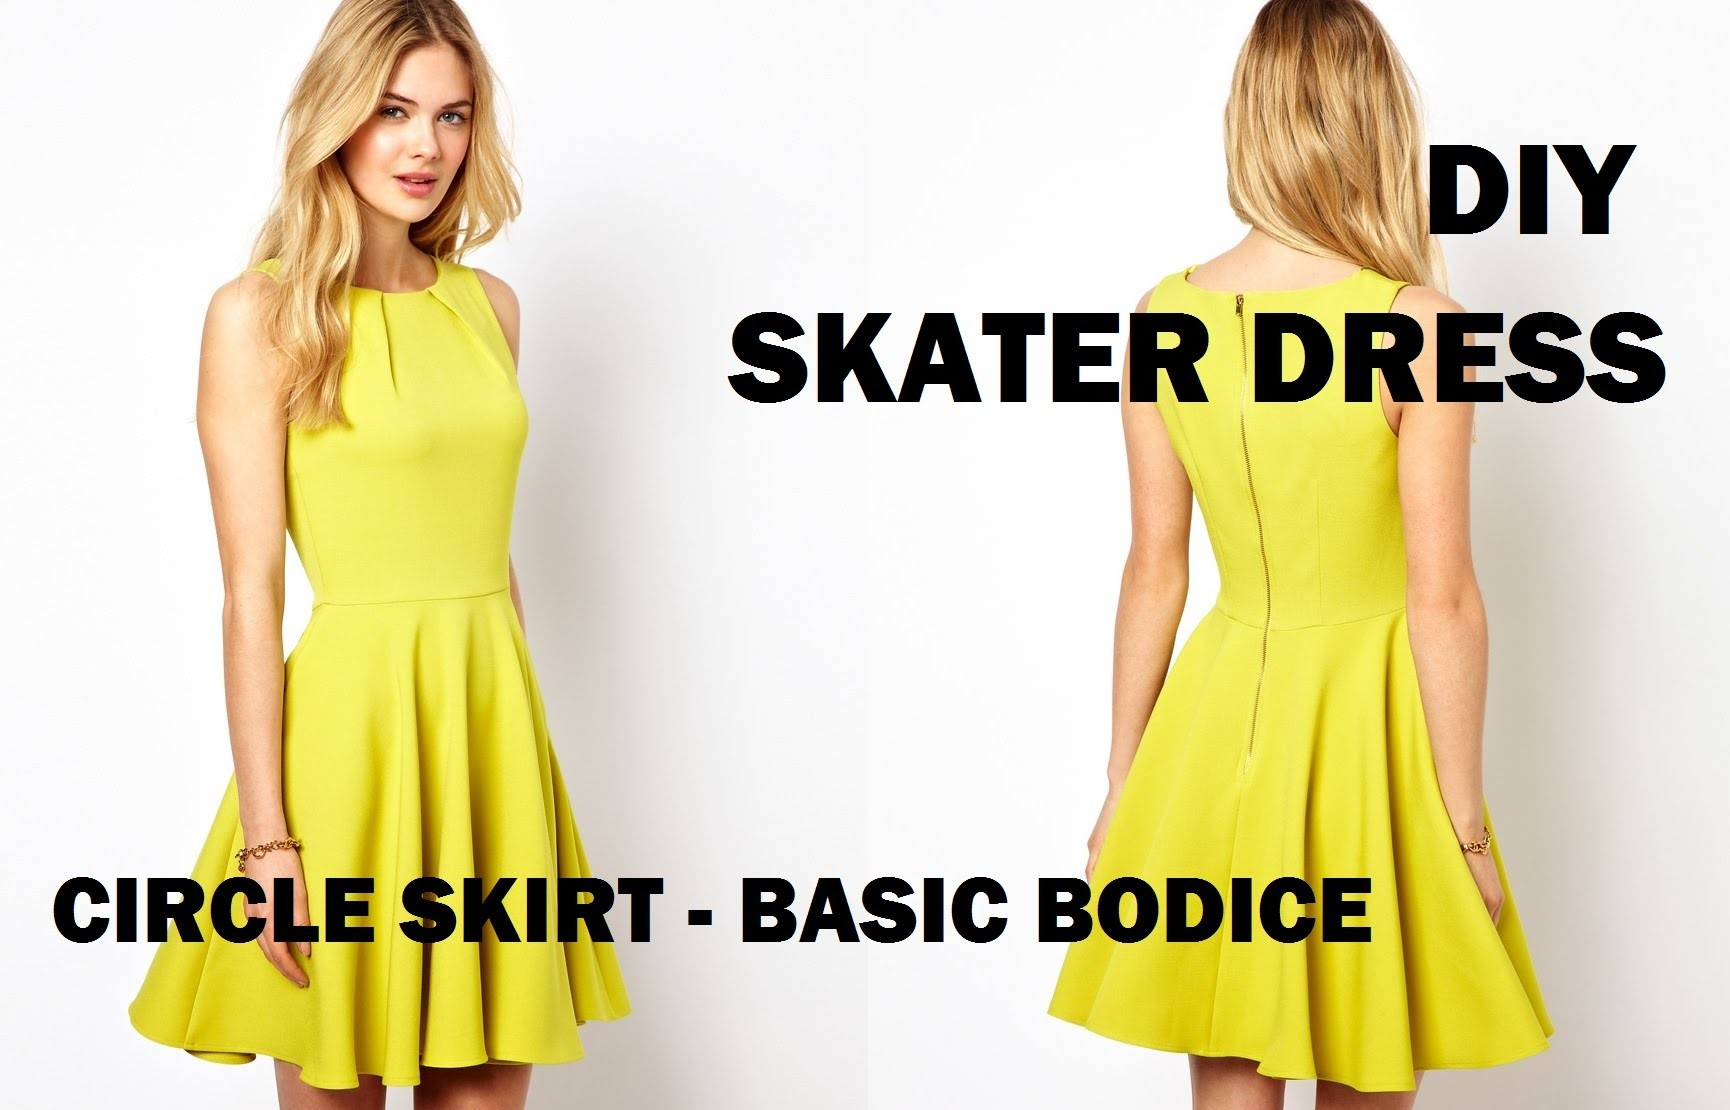 DIY   HOW TO MAKE A SKATER DRESS (CIRCLE SKIRT)